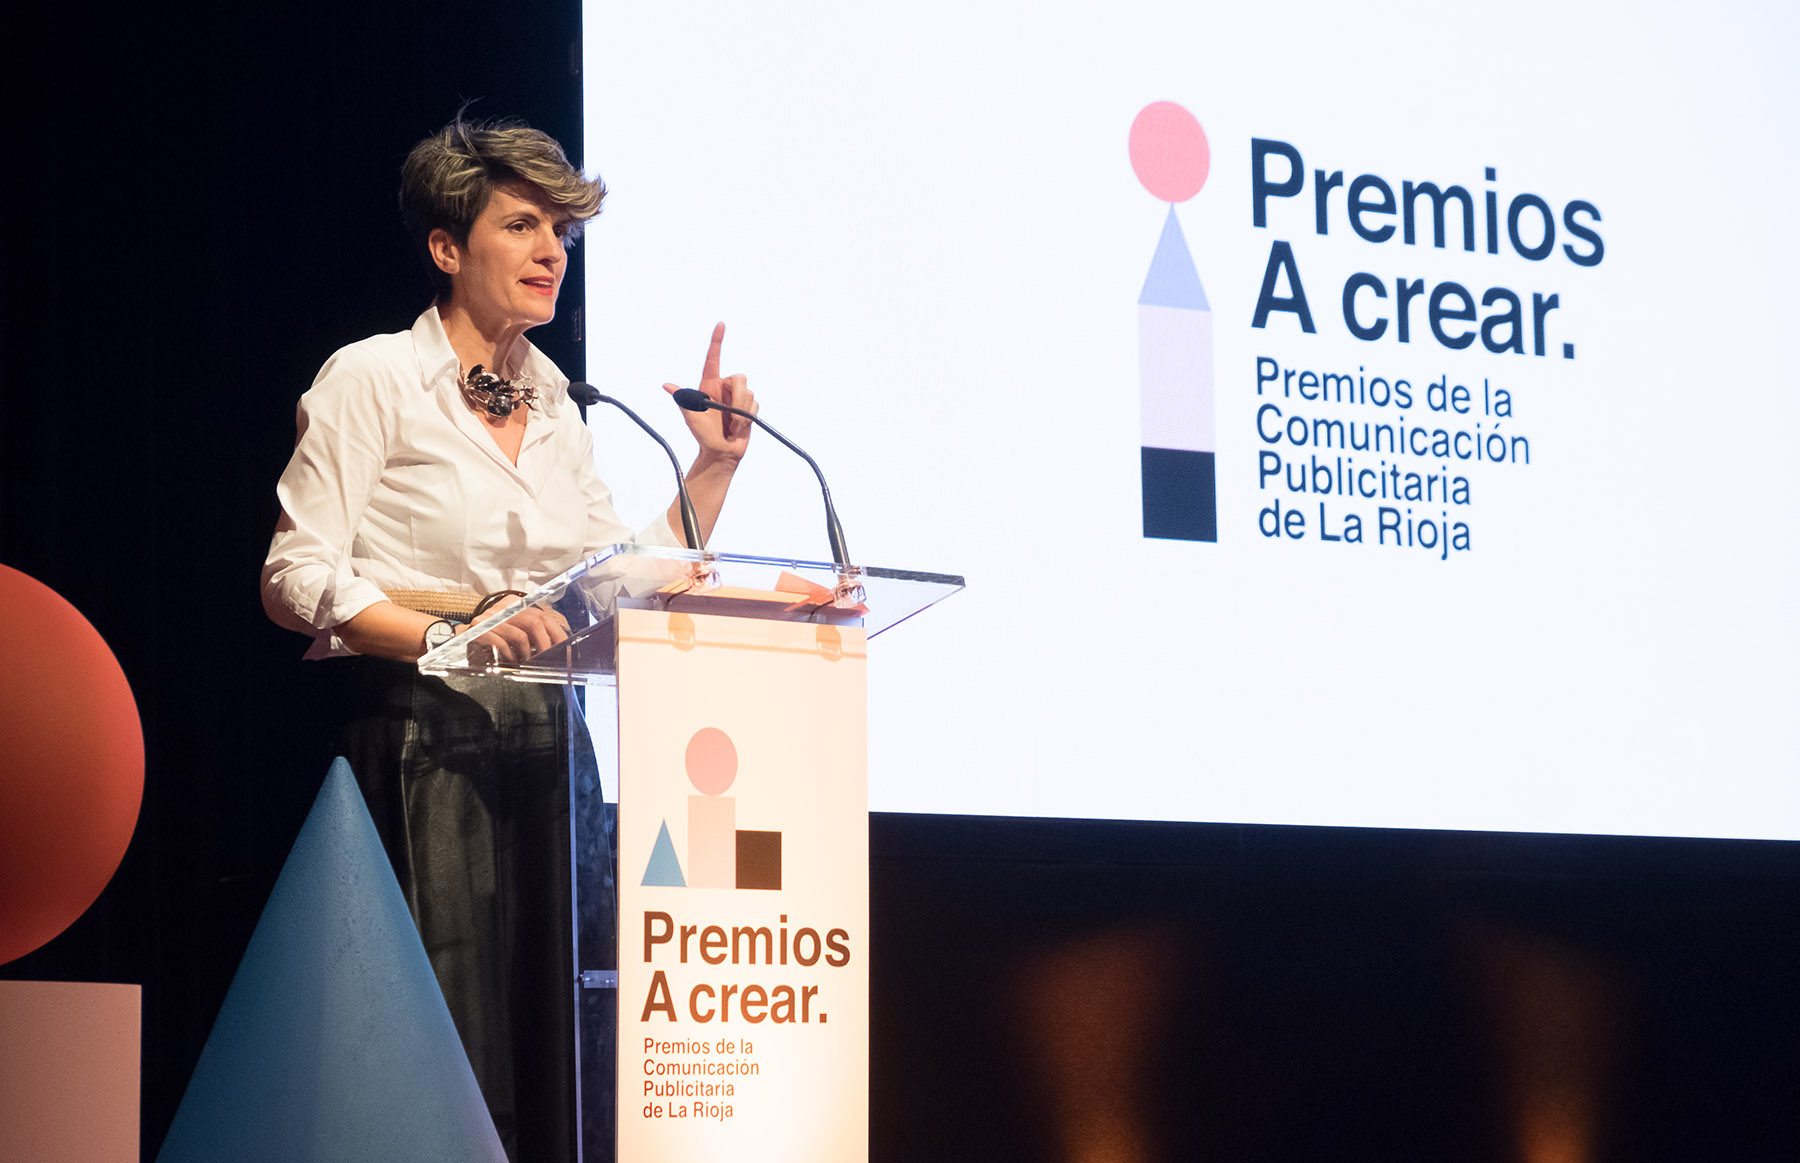 PREMIOSA-CREAR-FD-6591